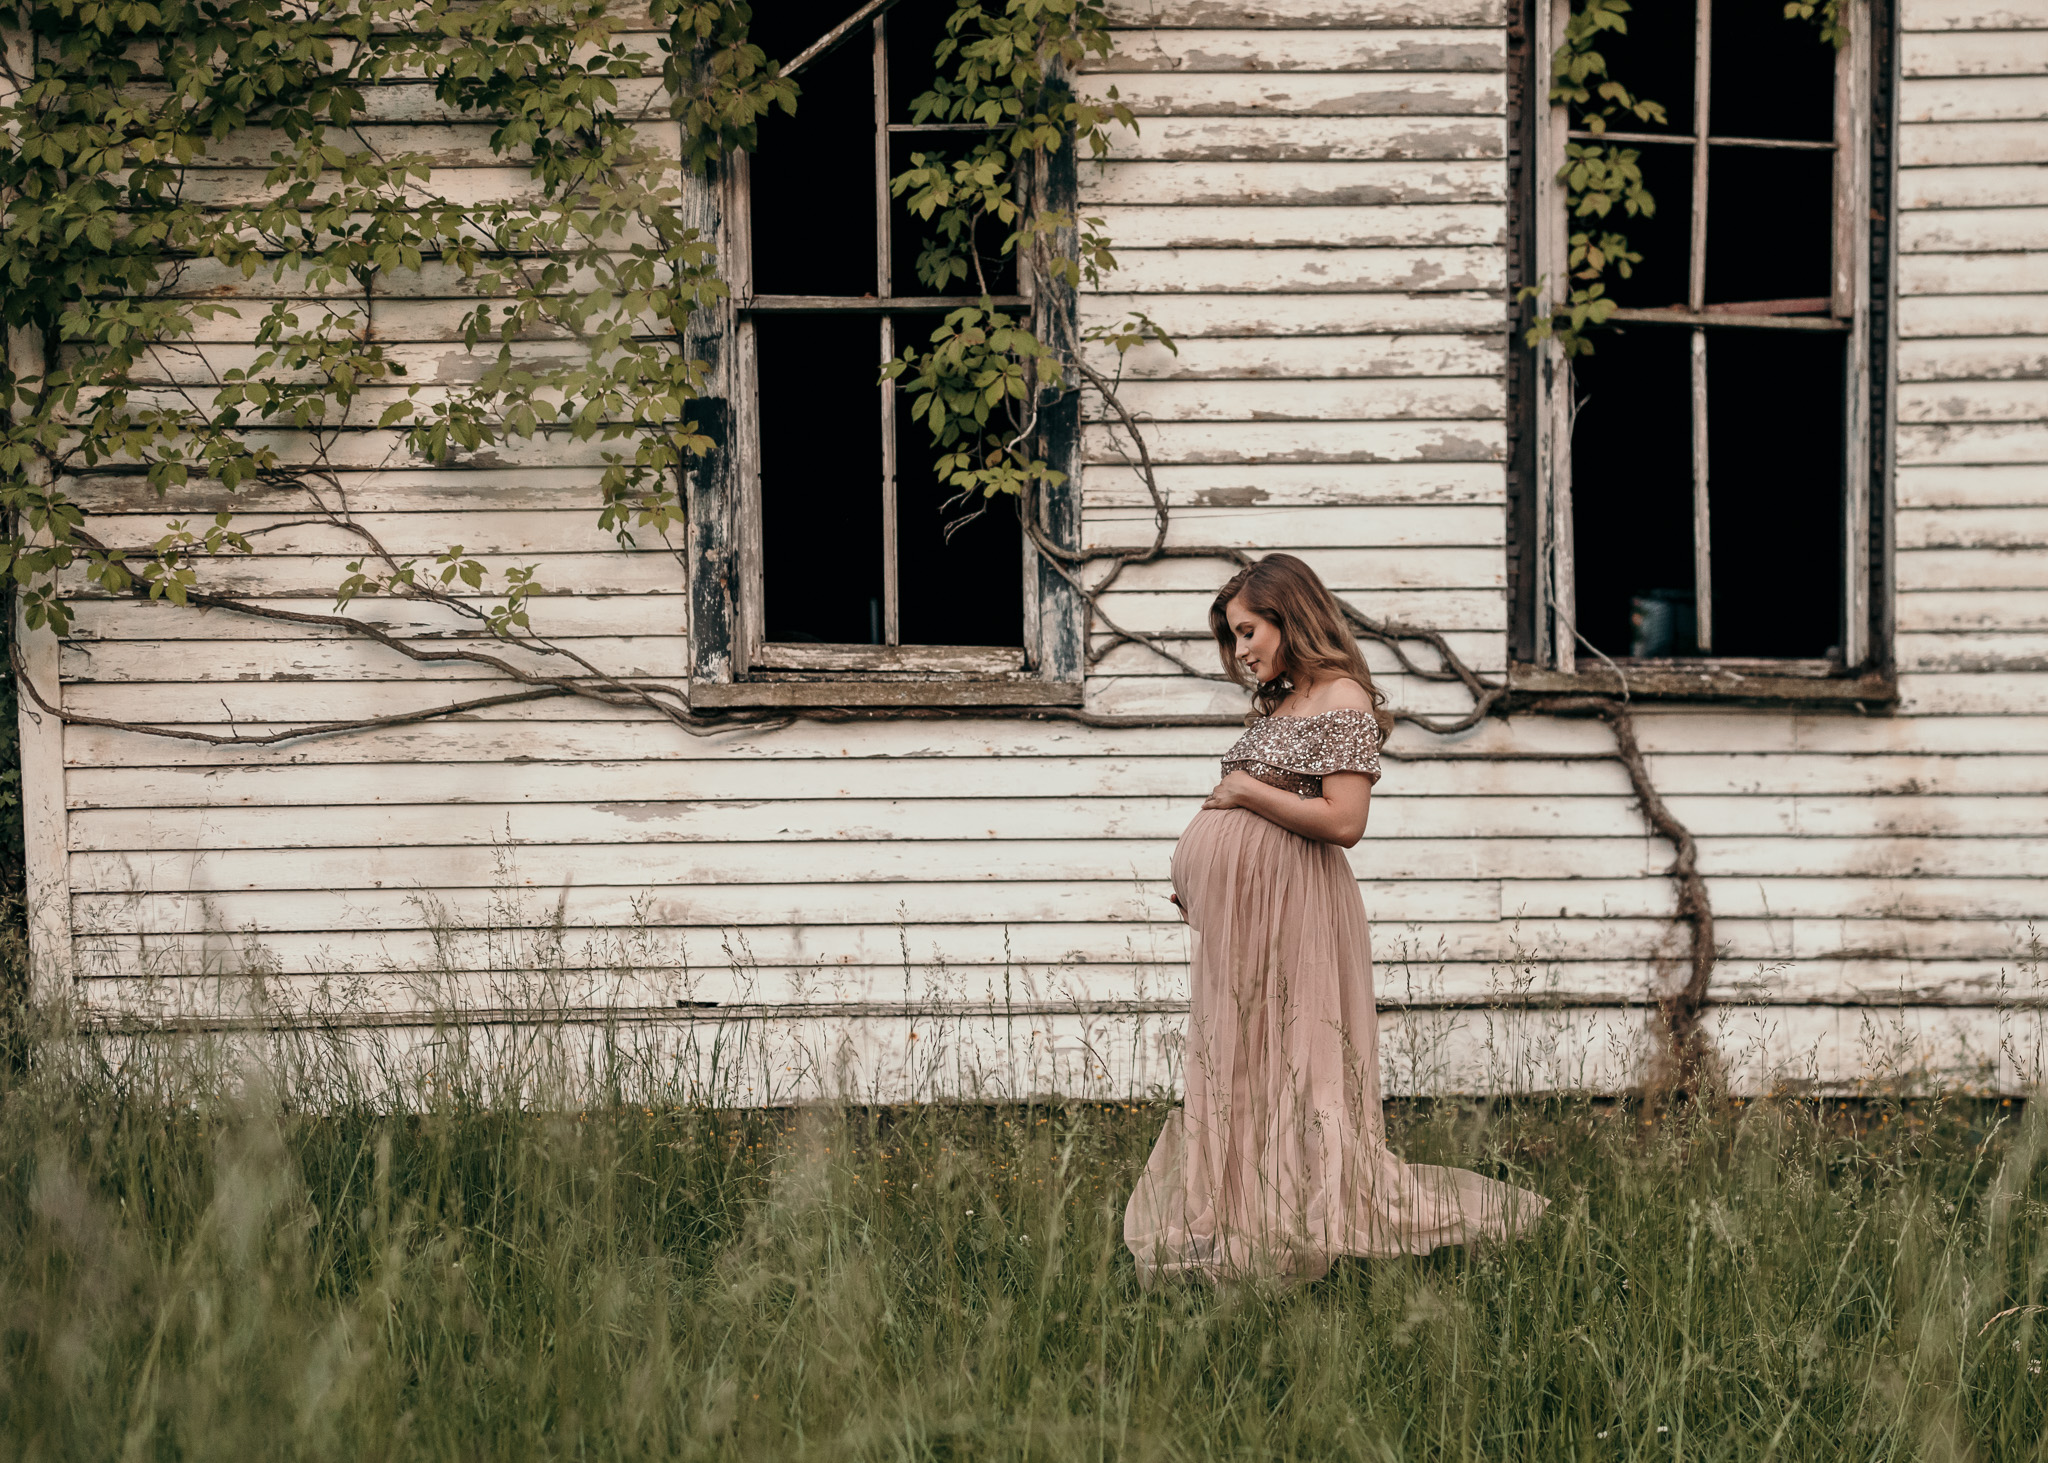 maternity dress for photos